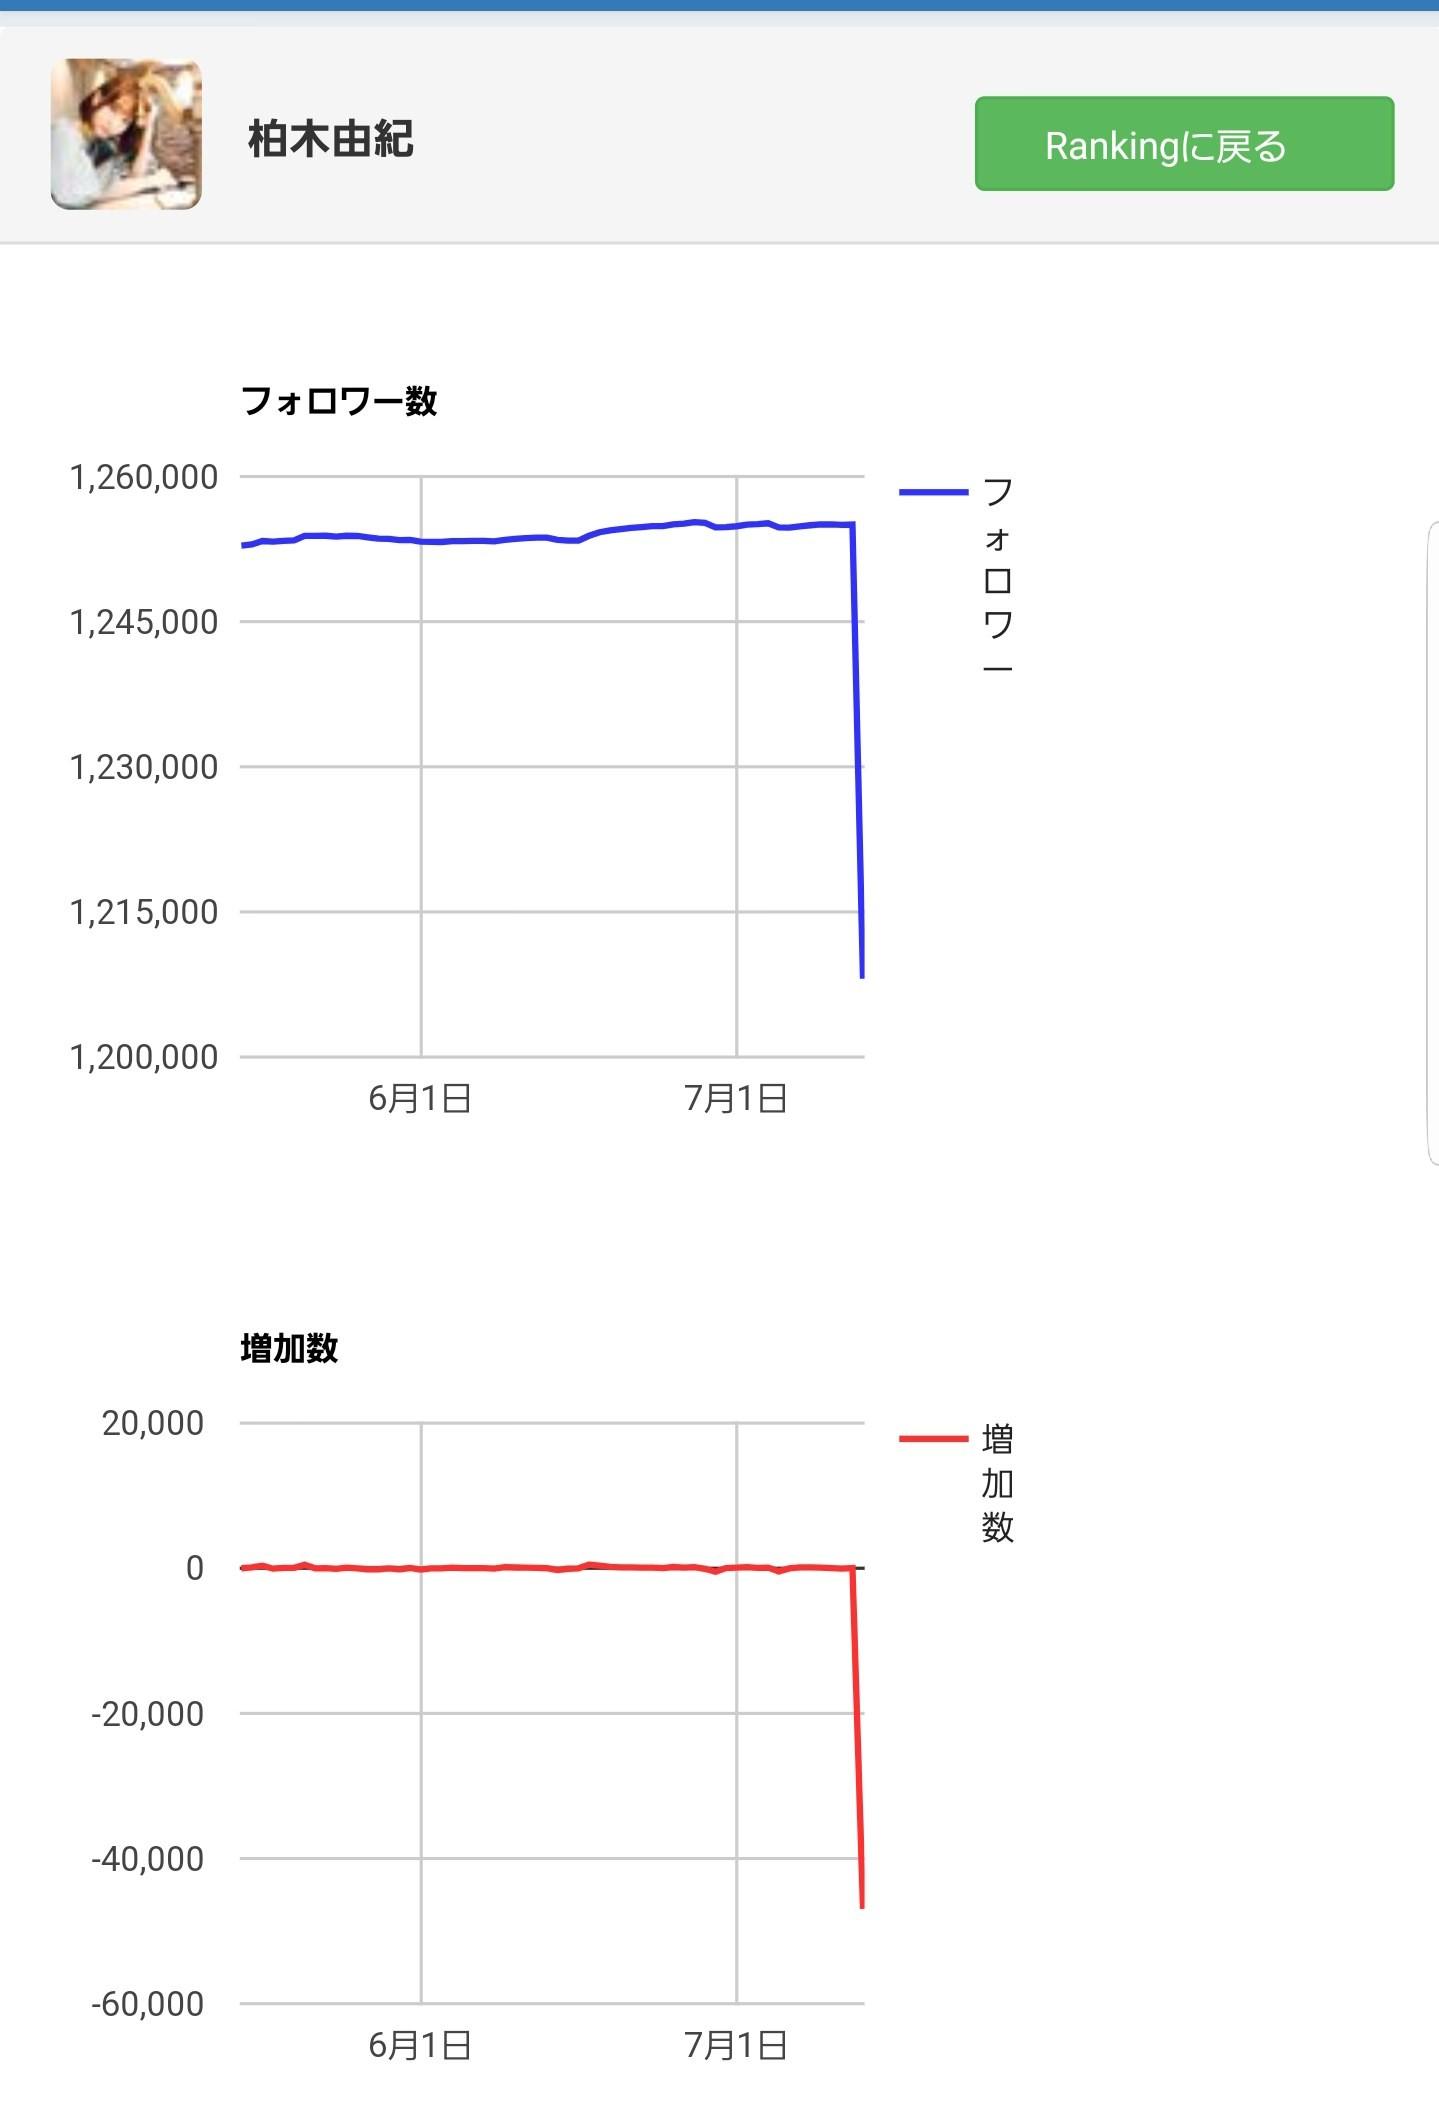 【Breaking News】 Yuki Kashiwagi 's Twitter followers suddenly decline sharply wwwww www